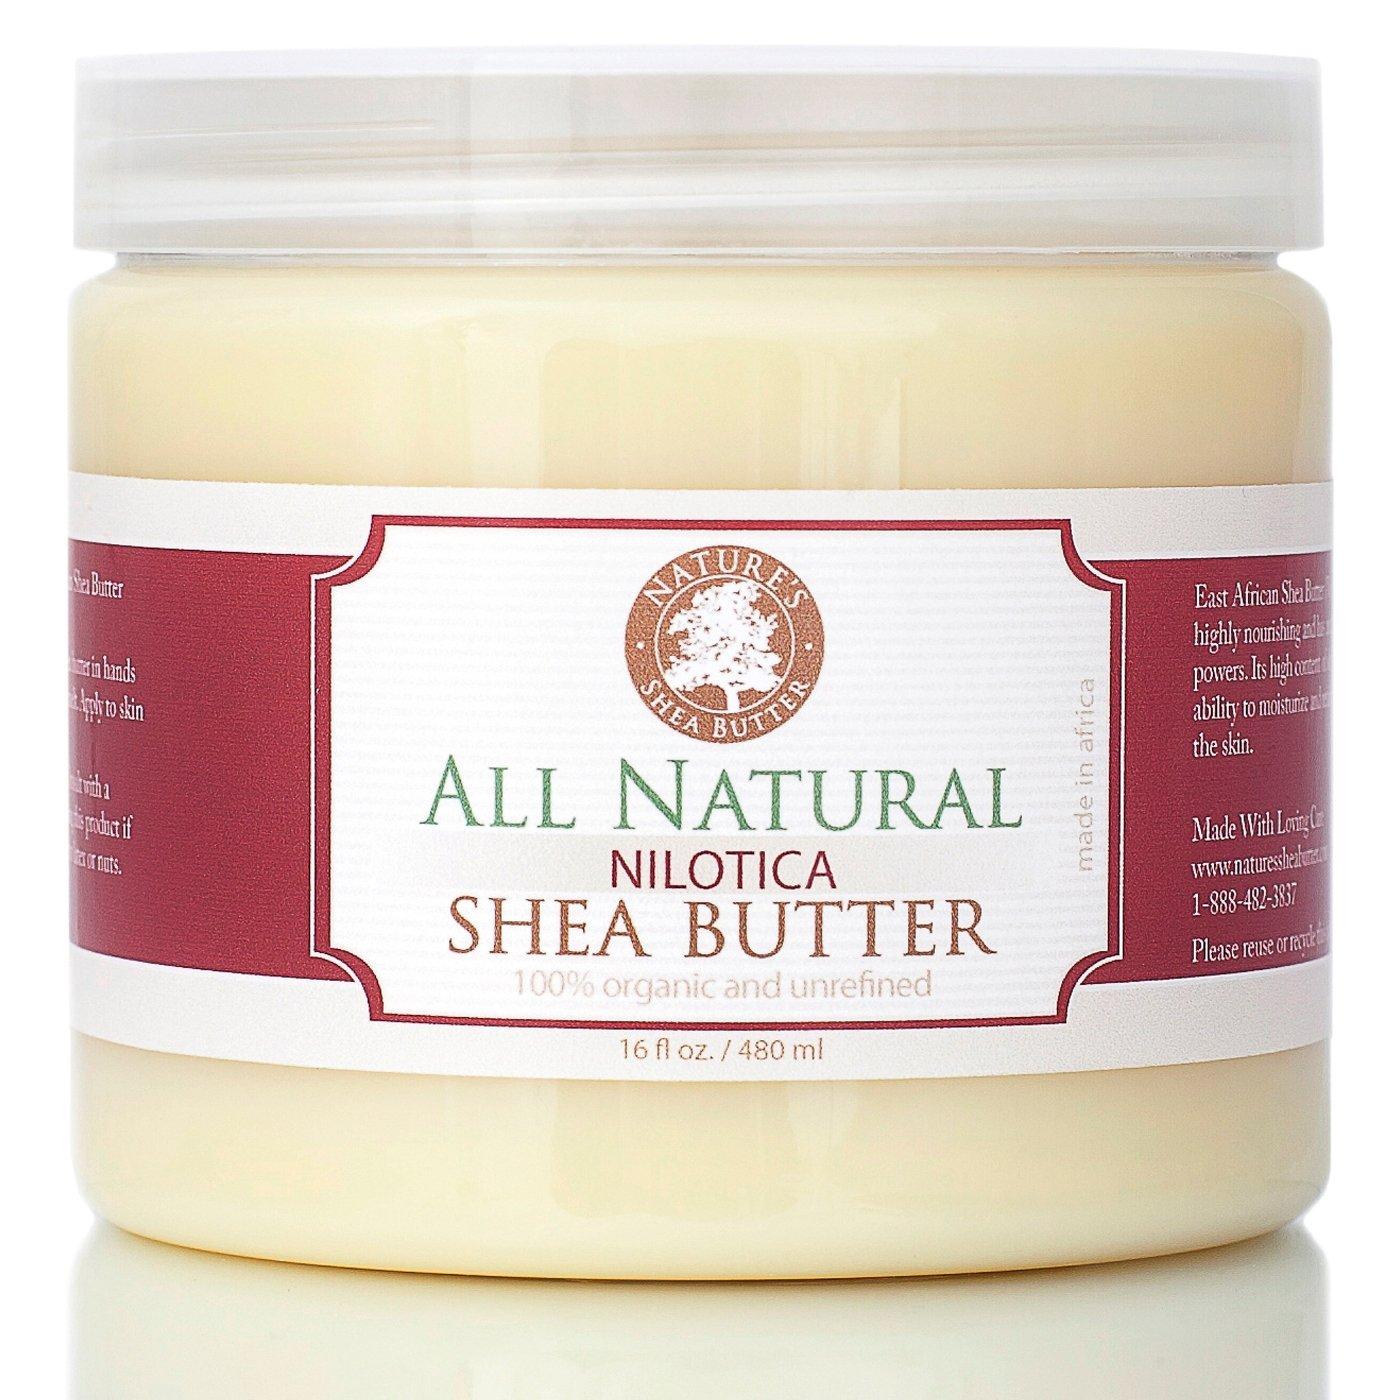 Nature's Shea Butter Nilotica East African Shea Butter, 16 fl. oz.